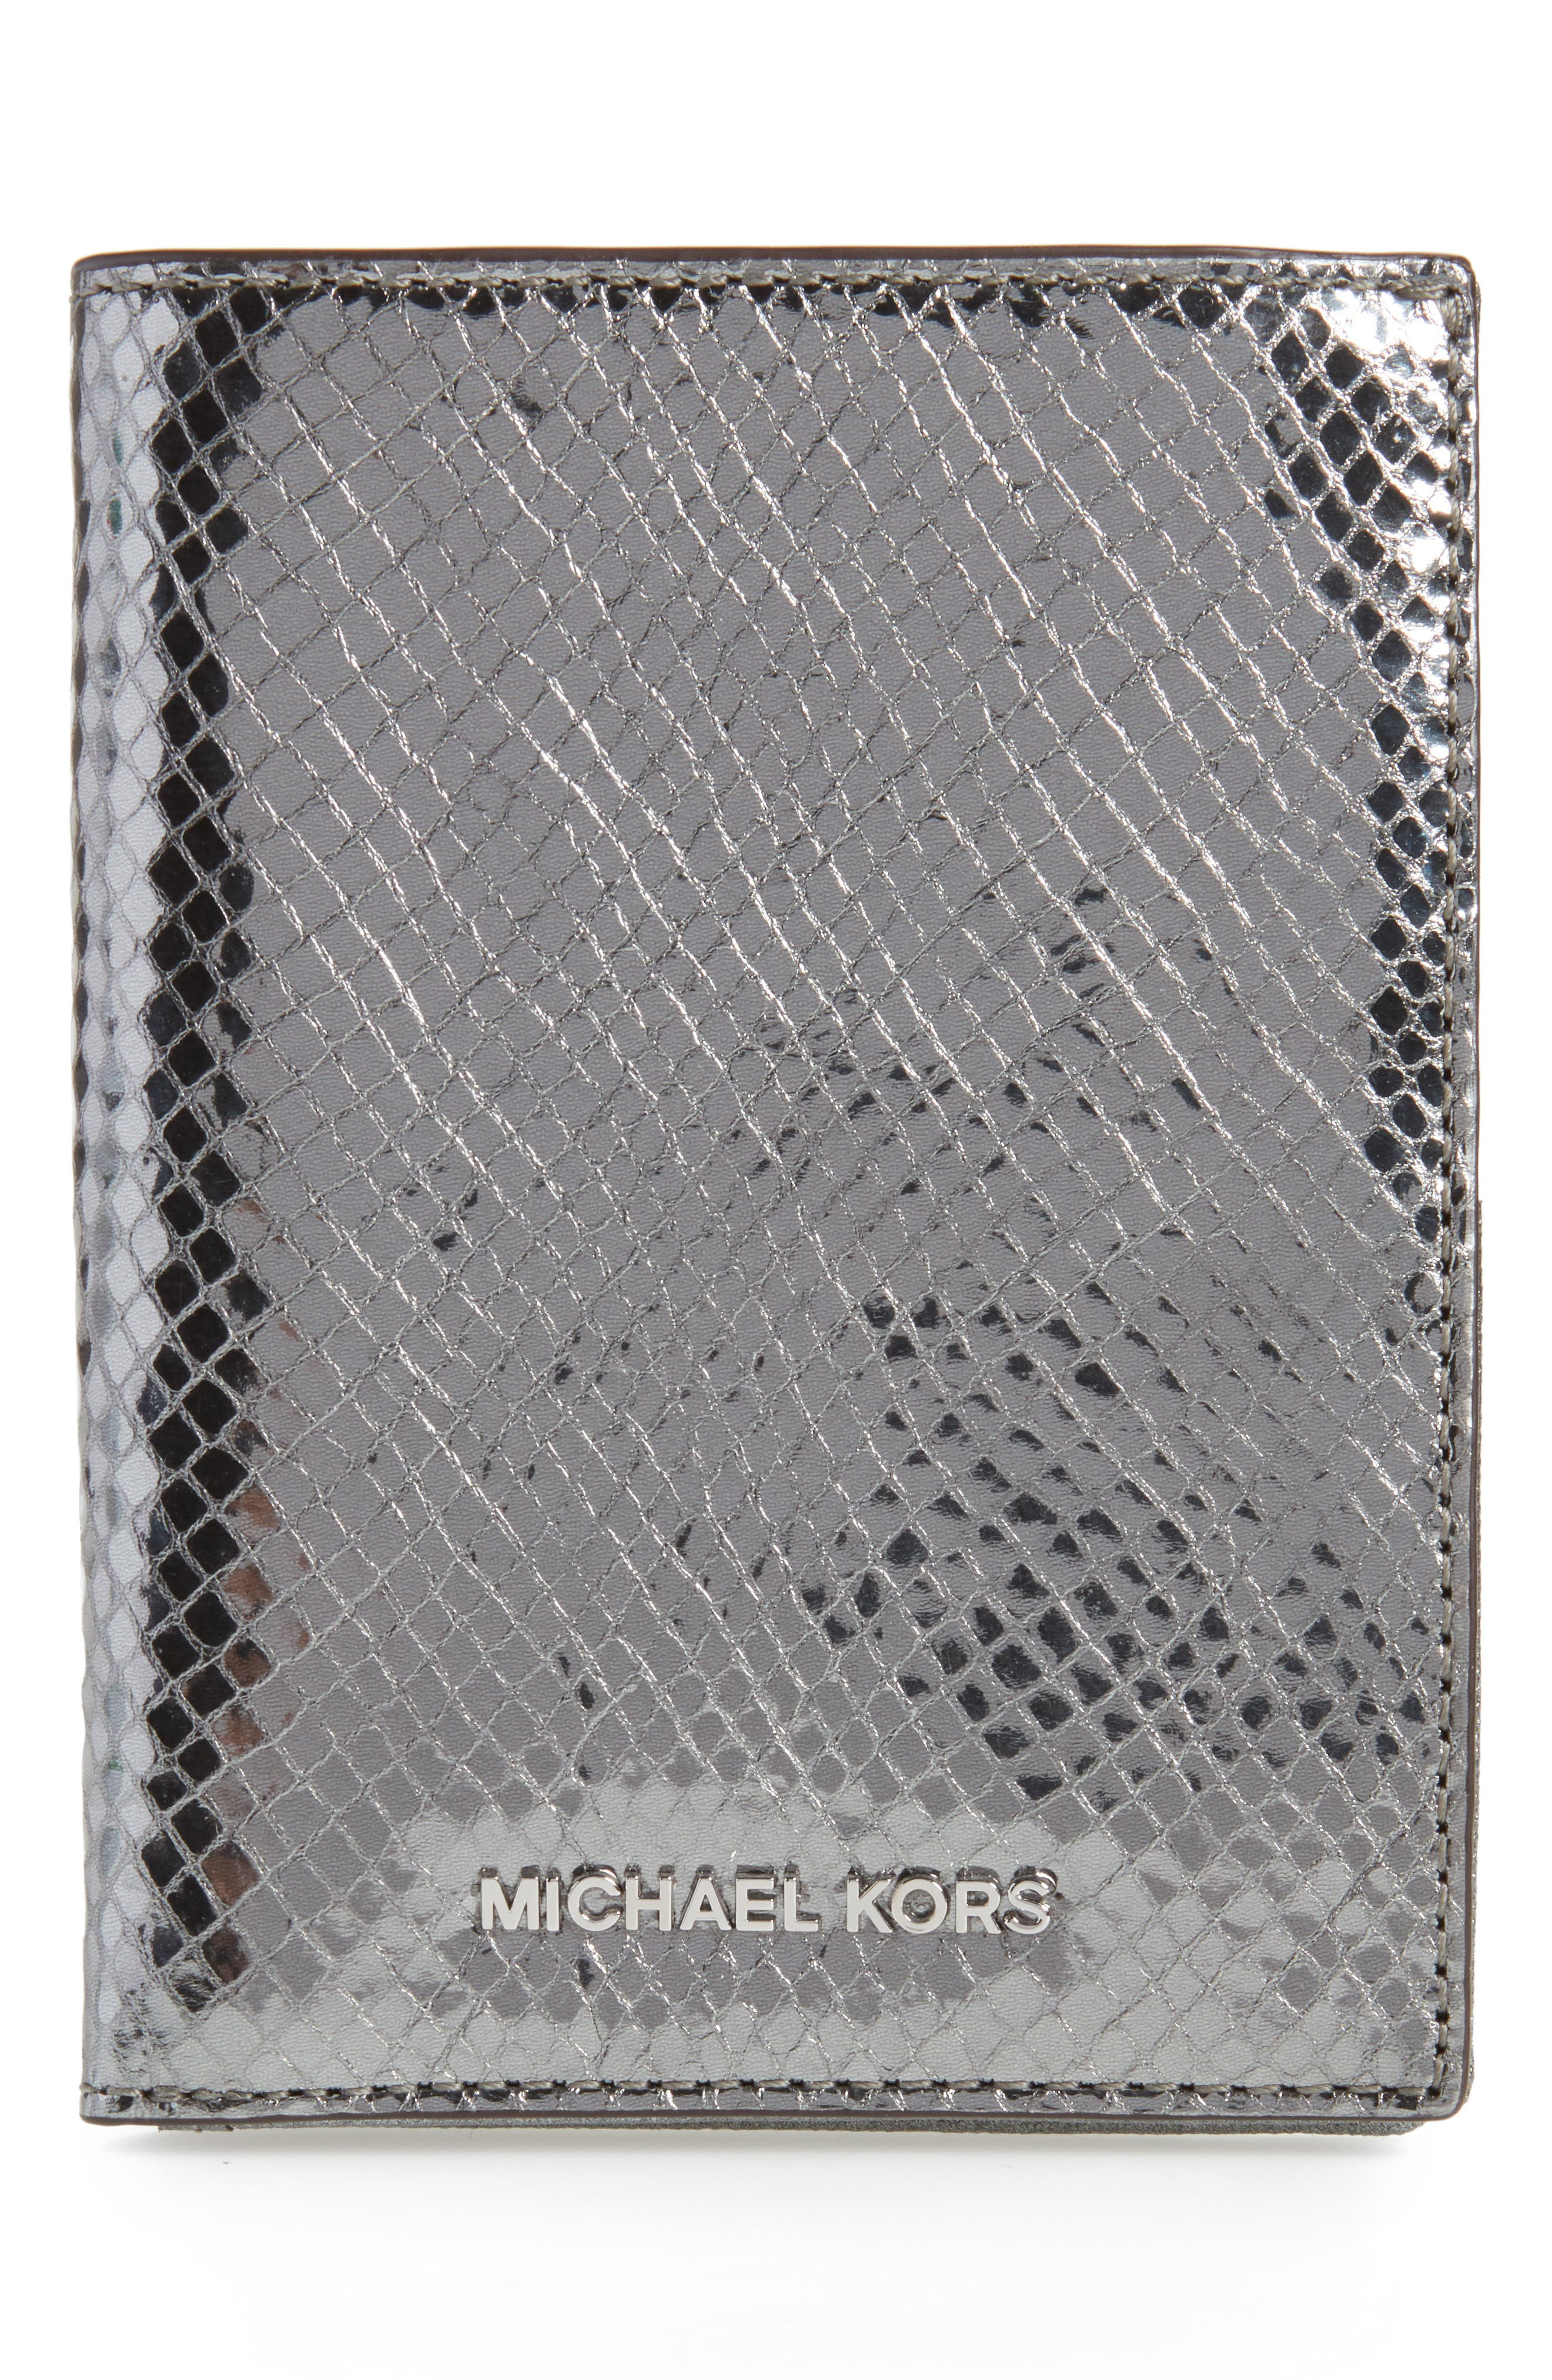 Main Image - Michael Kors Money Pieces Leather Passport Wallet